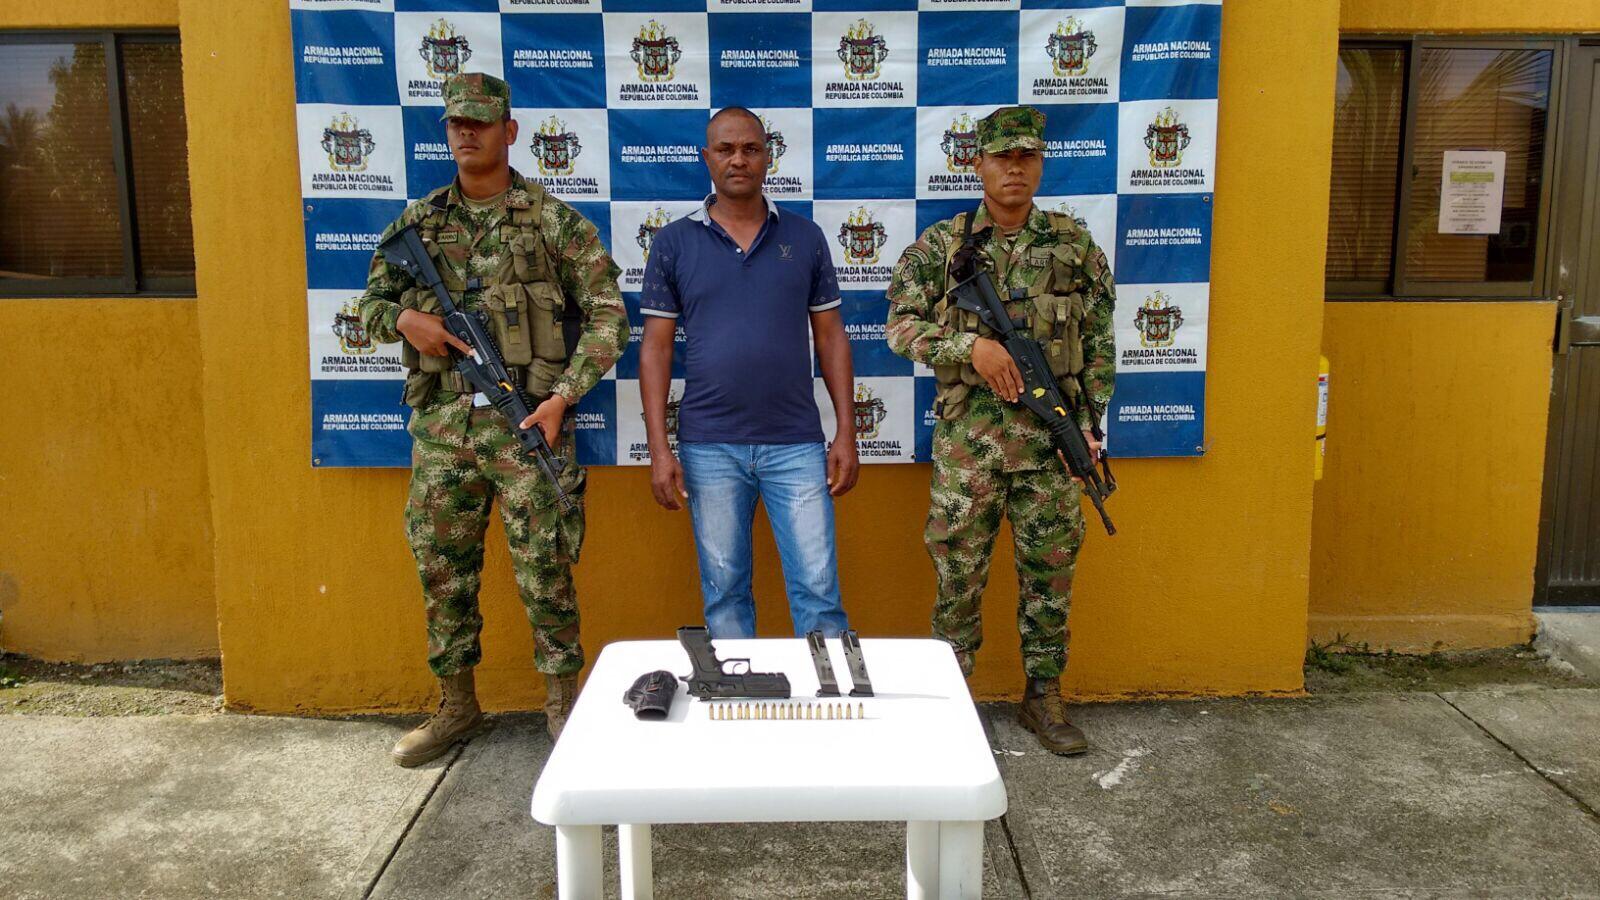 Armada Nacional da duro golpe minería ilegal en Guapi, Cauca